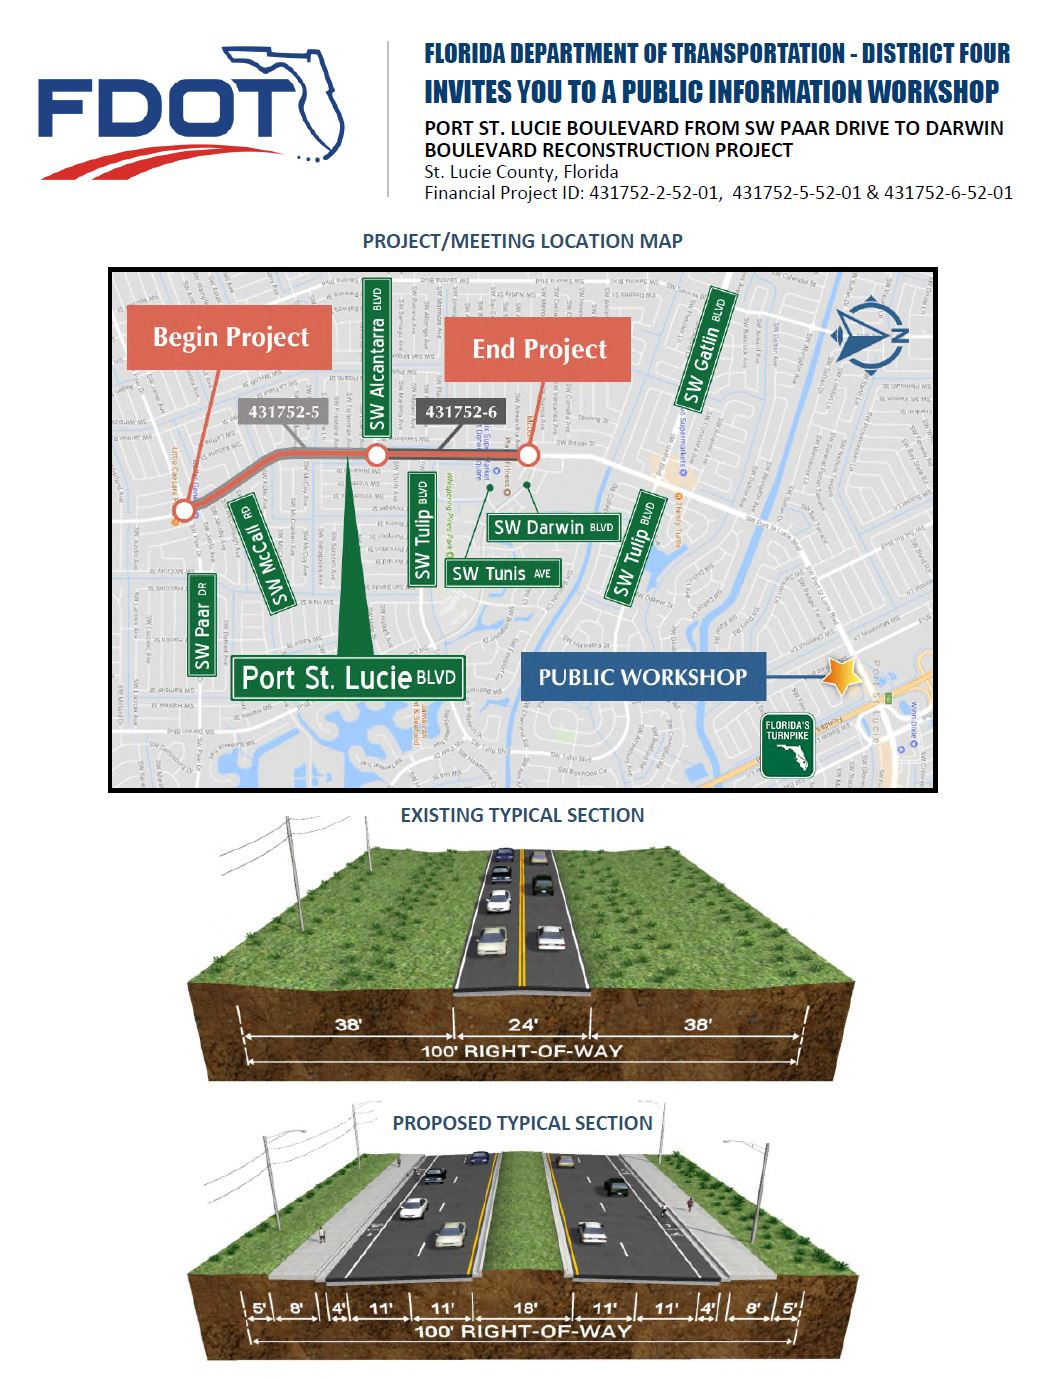 FDOT Workshop: PSL Blvd from SW Paar Drive to Darwin Blvd